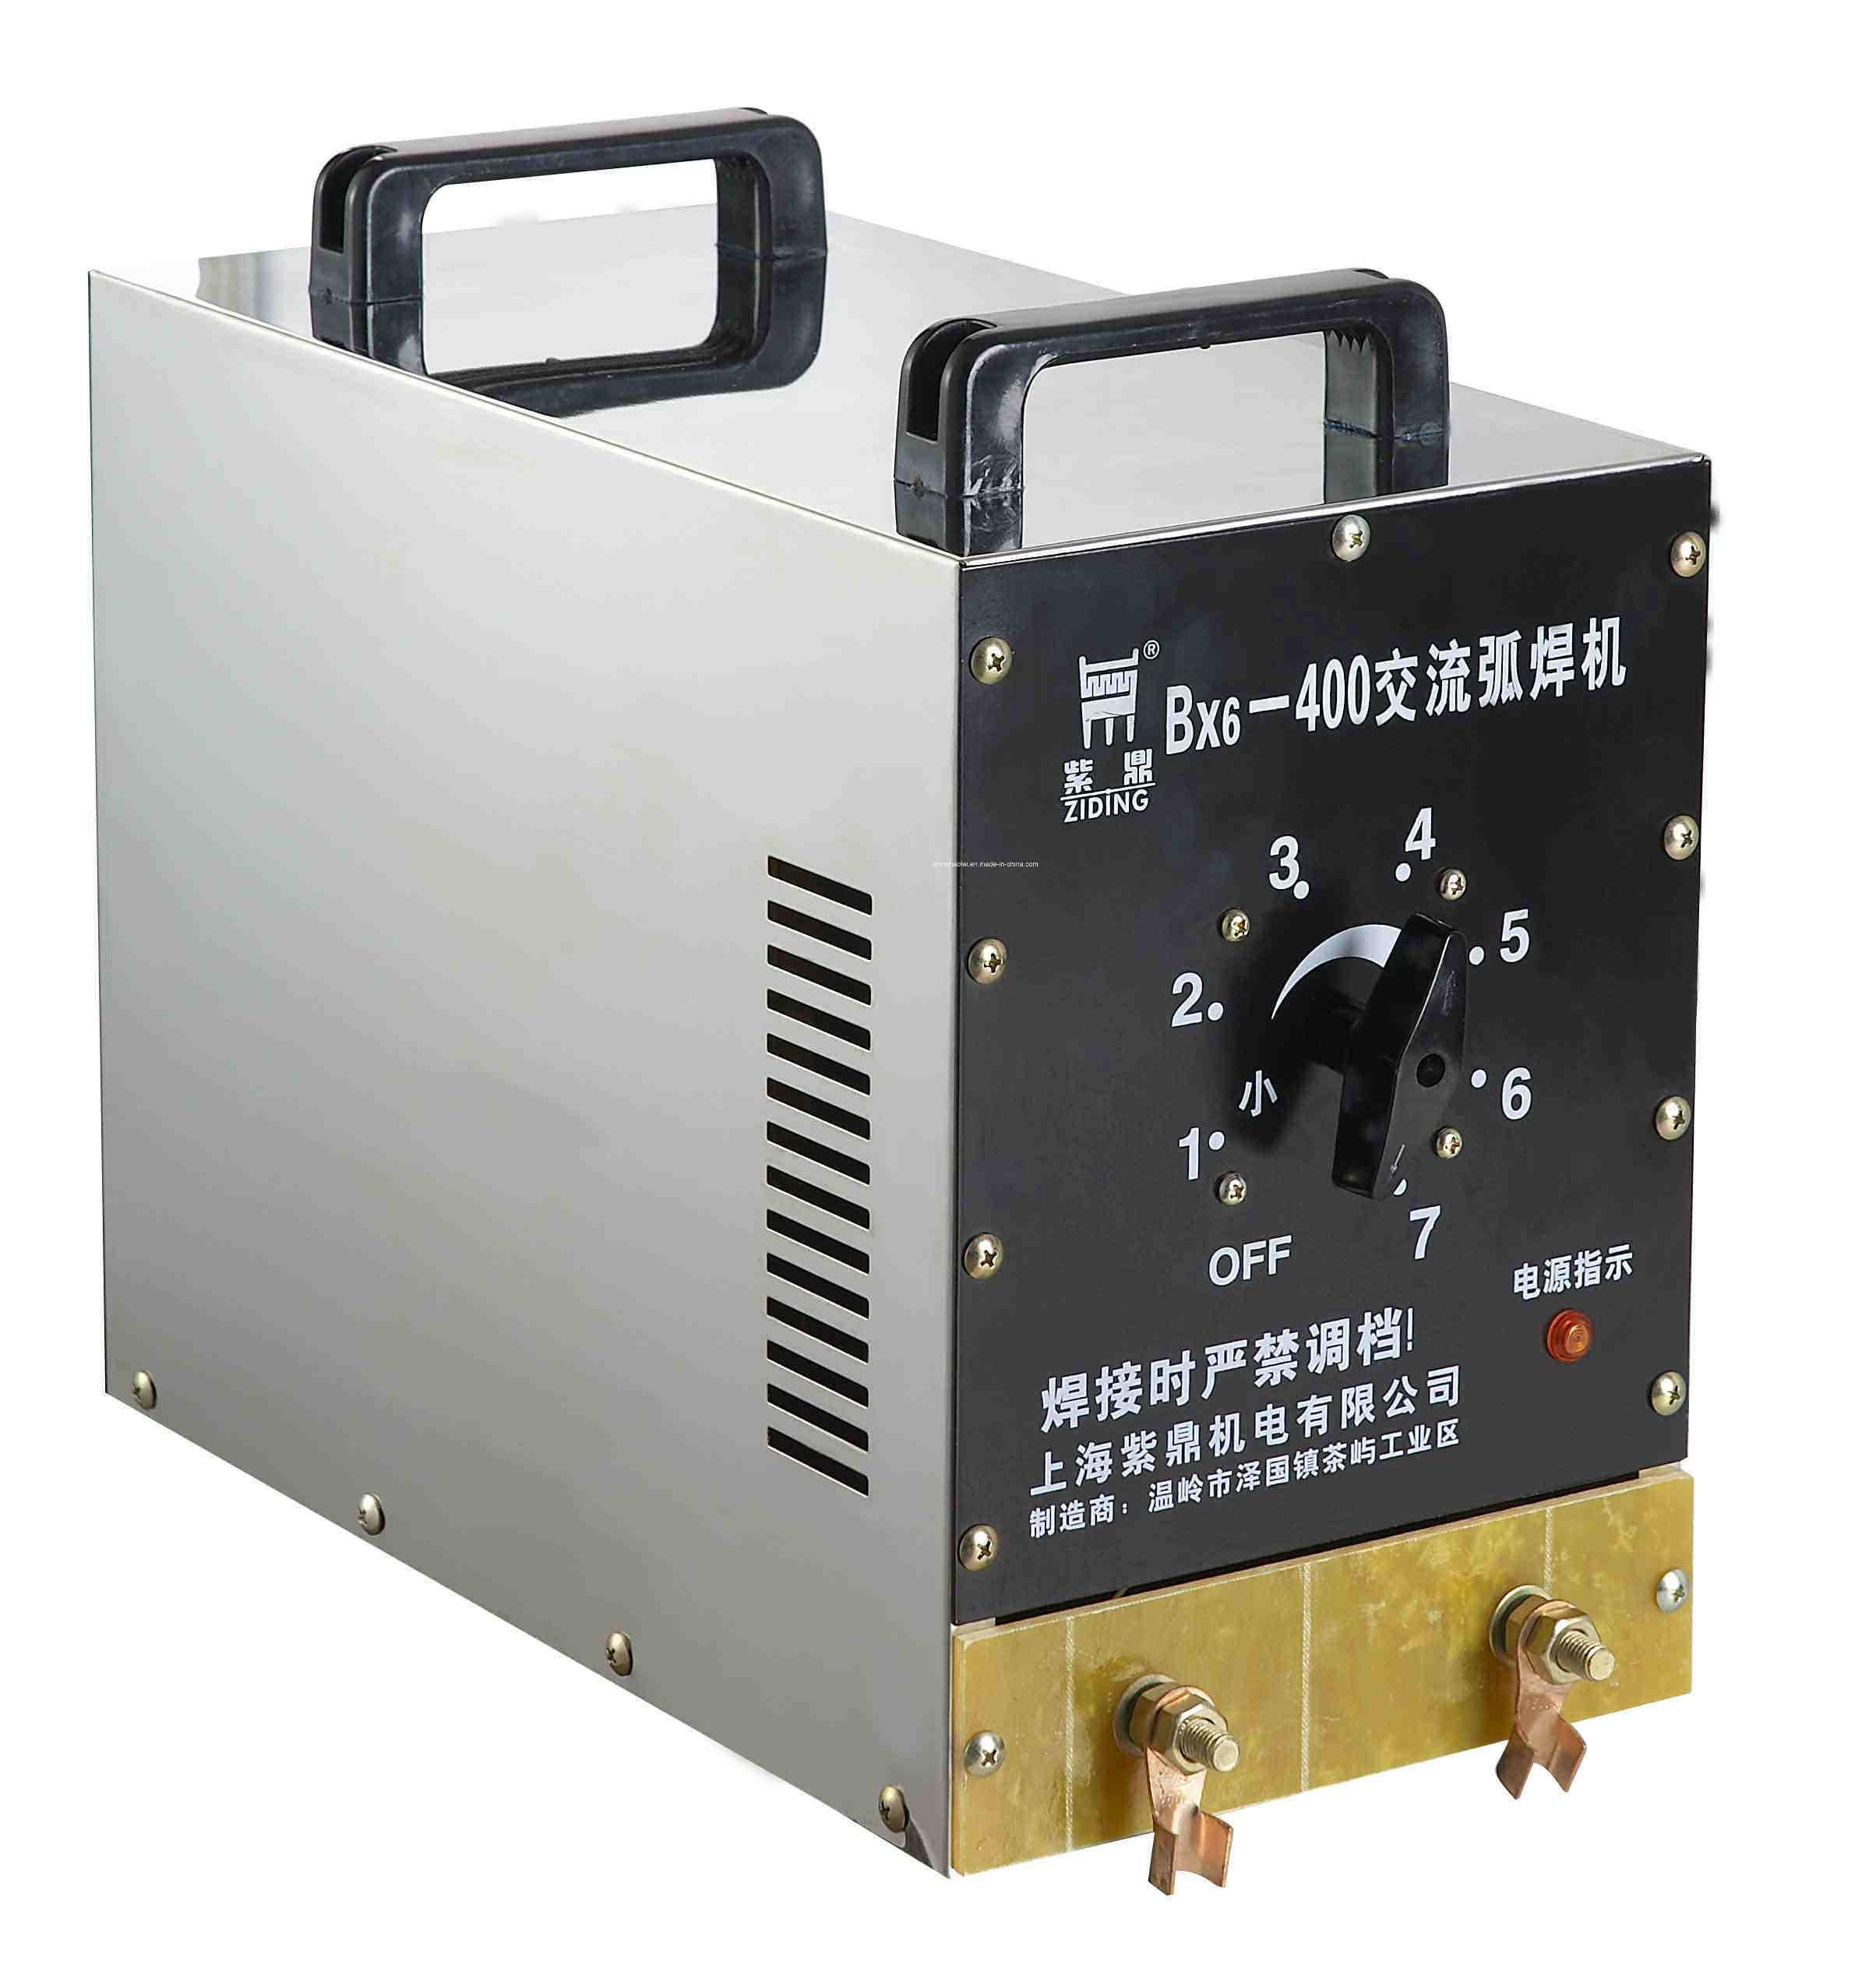 Bx6-300b) Welding Machine